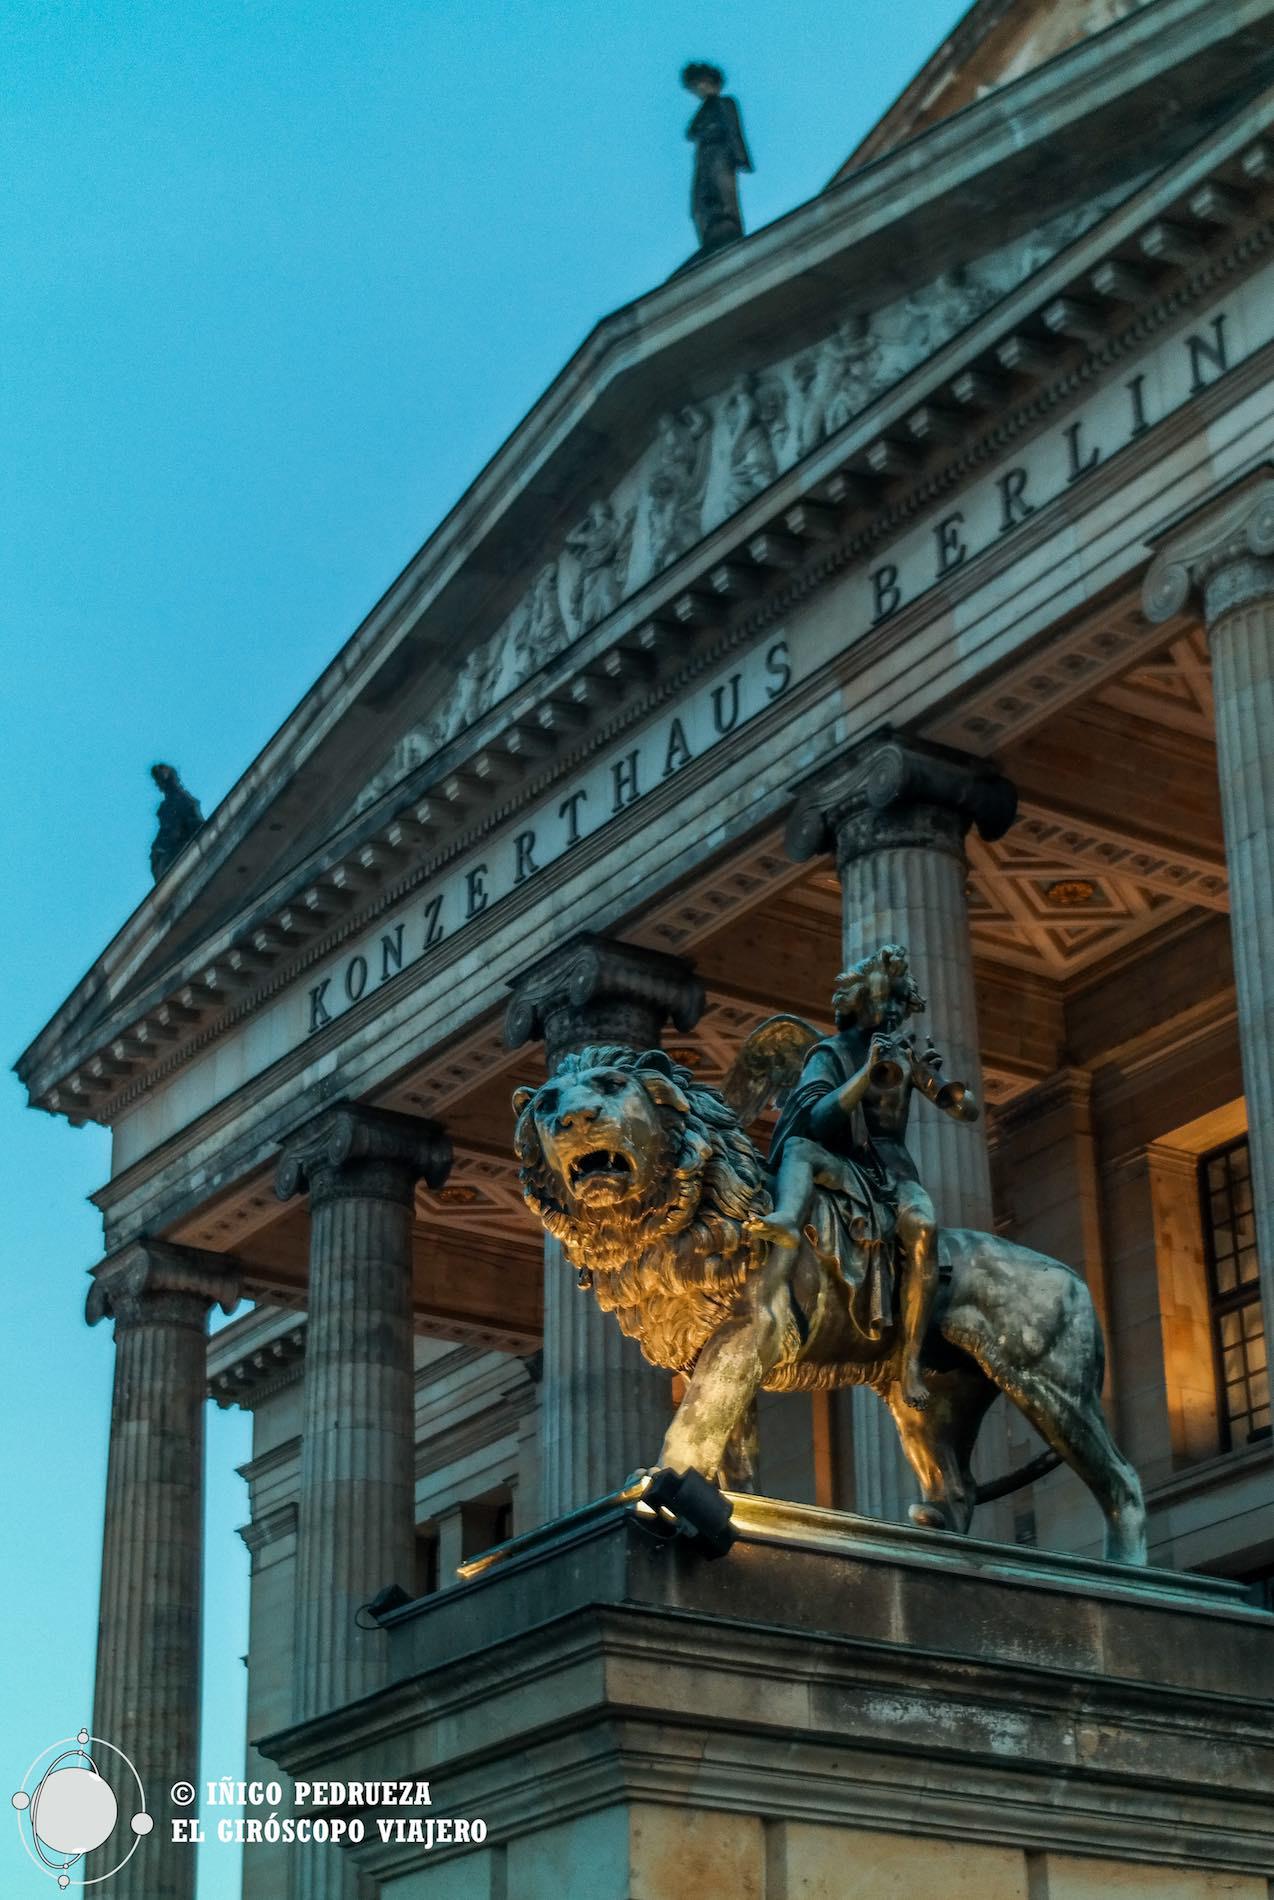 Konzerthaus Berlin en la plaza Gendarmenmarkt. ©Iñigo Pedrueza.